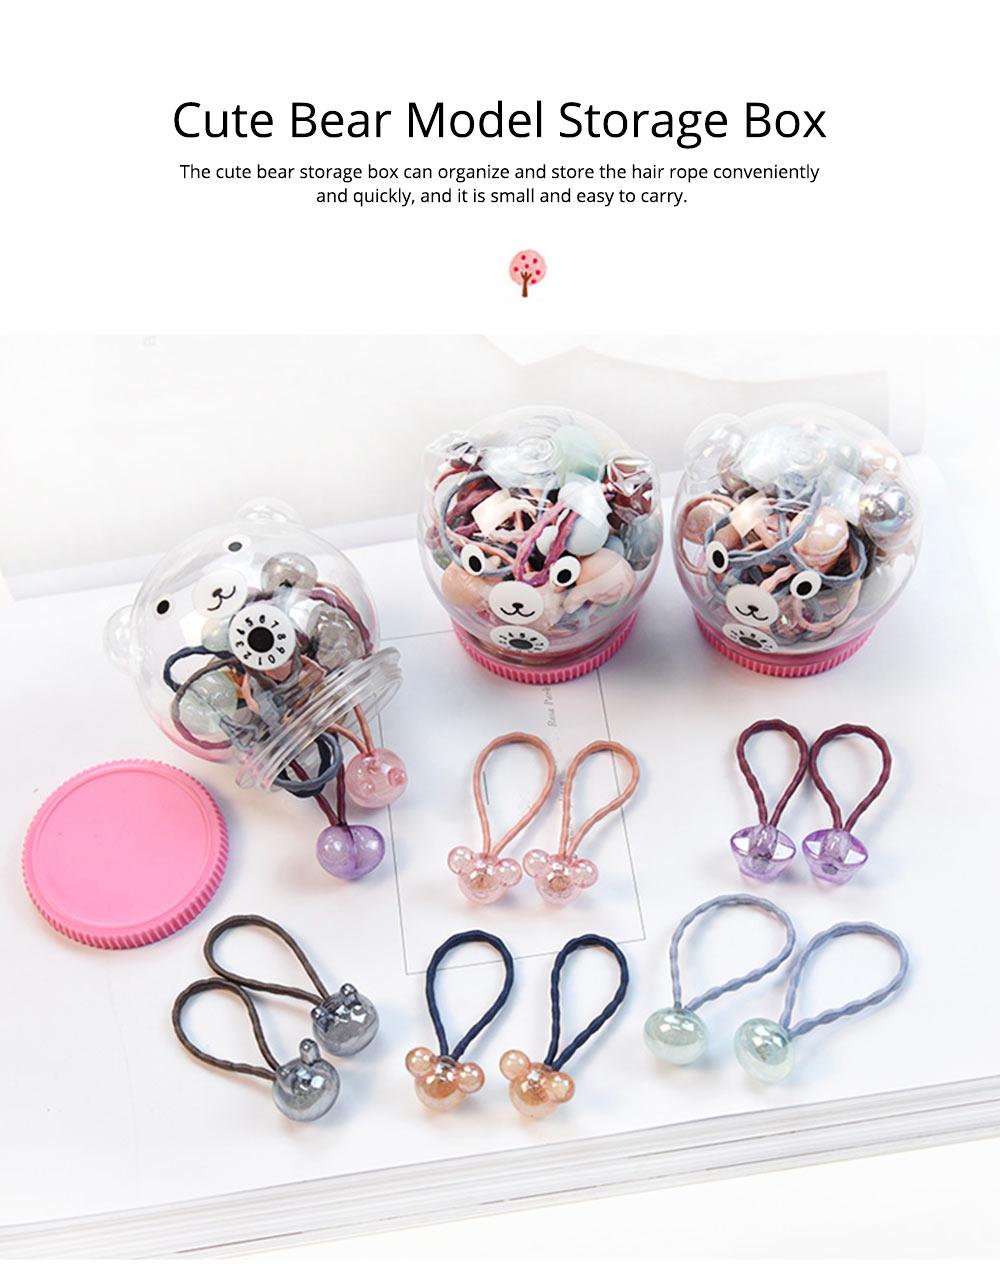 Fancy Beautiful Elastic Hair Band, Cartoon Animal Star Round Model Hair Rope Set with Bear Storage Box 3